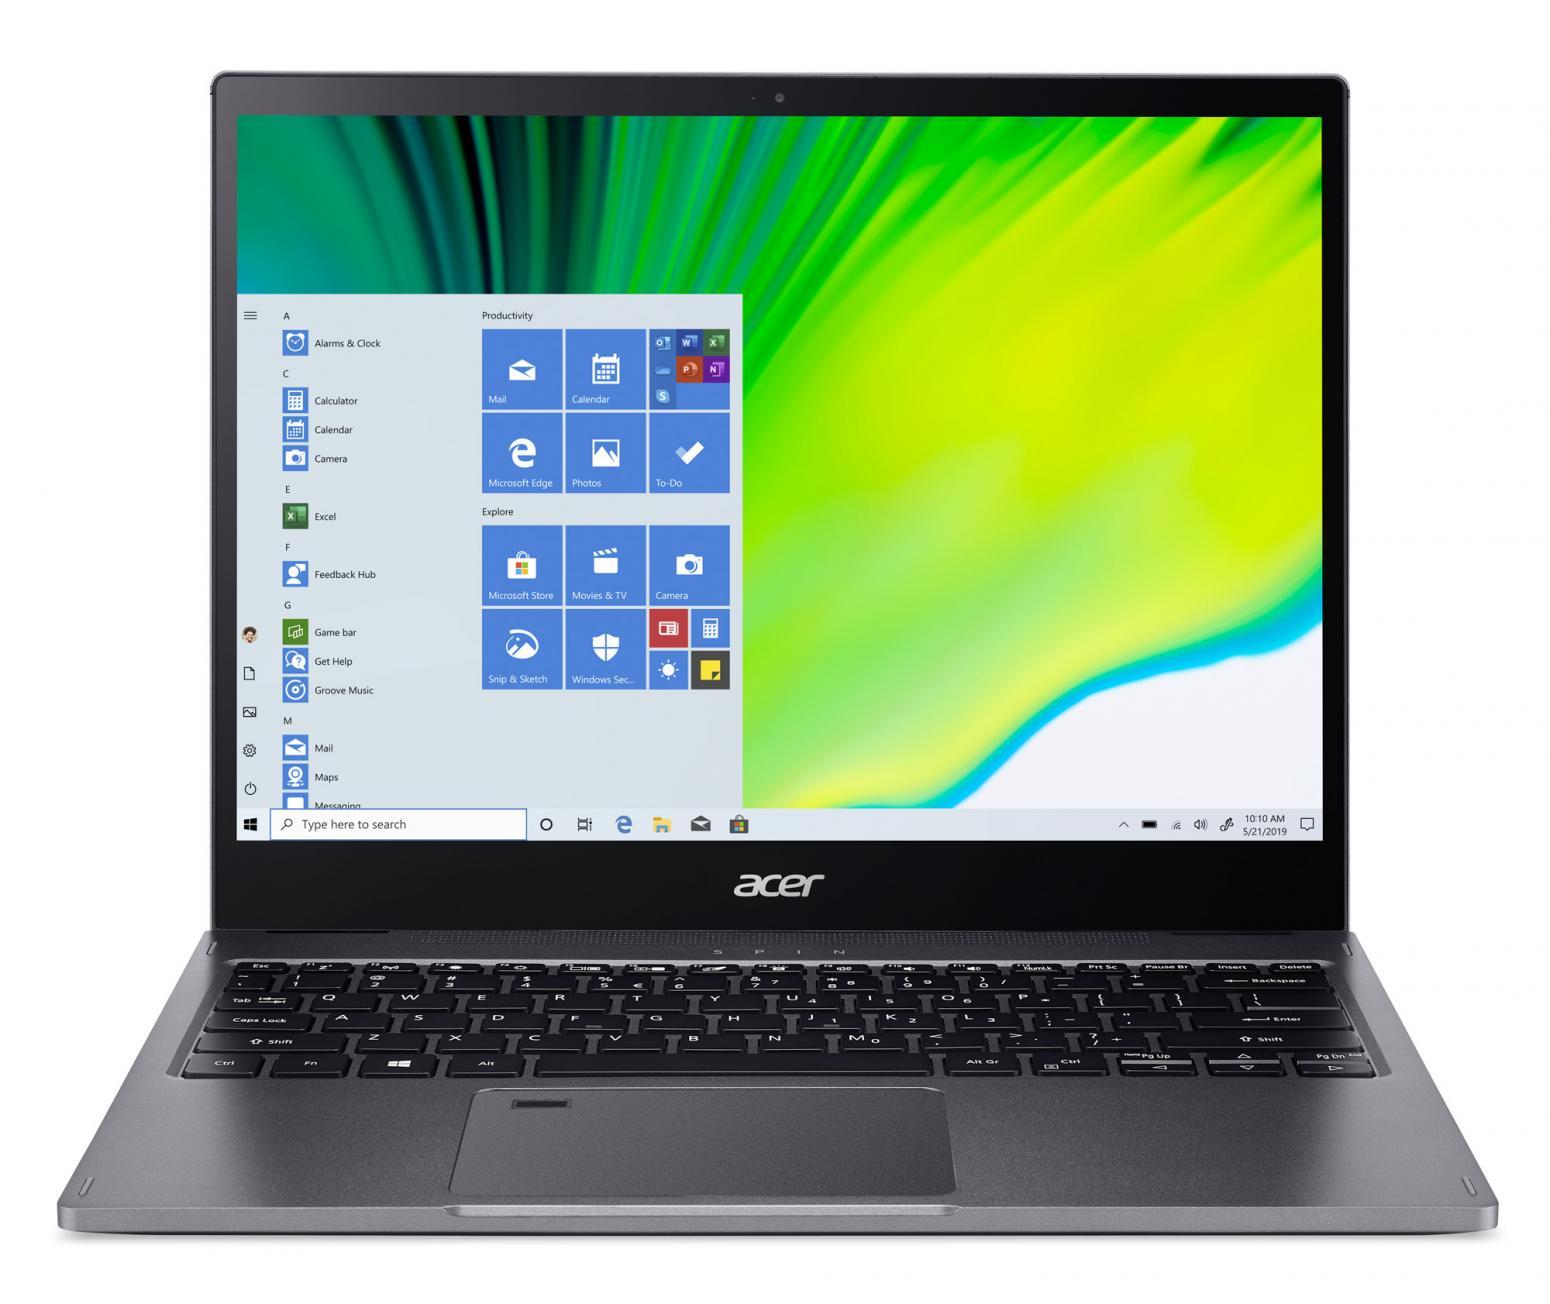 Ordinateur portable Acer Spin 5 SP513-54N-59ED Gris - QHD Tactile, Stylet - photo 4